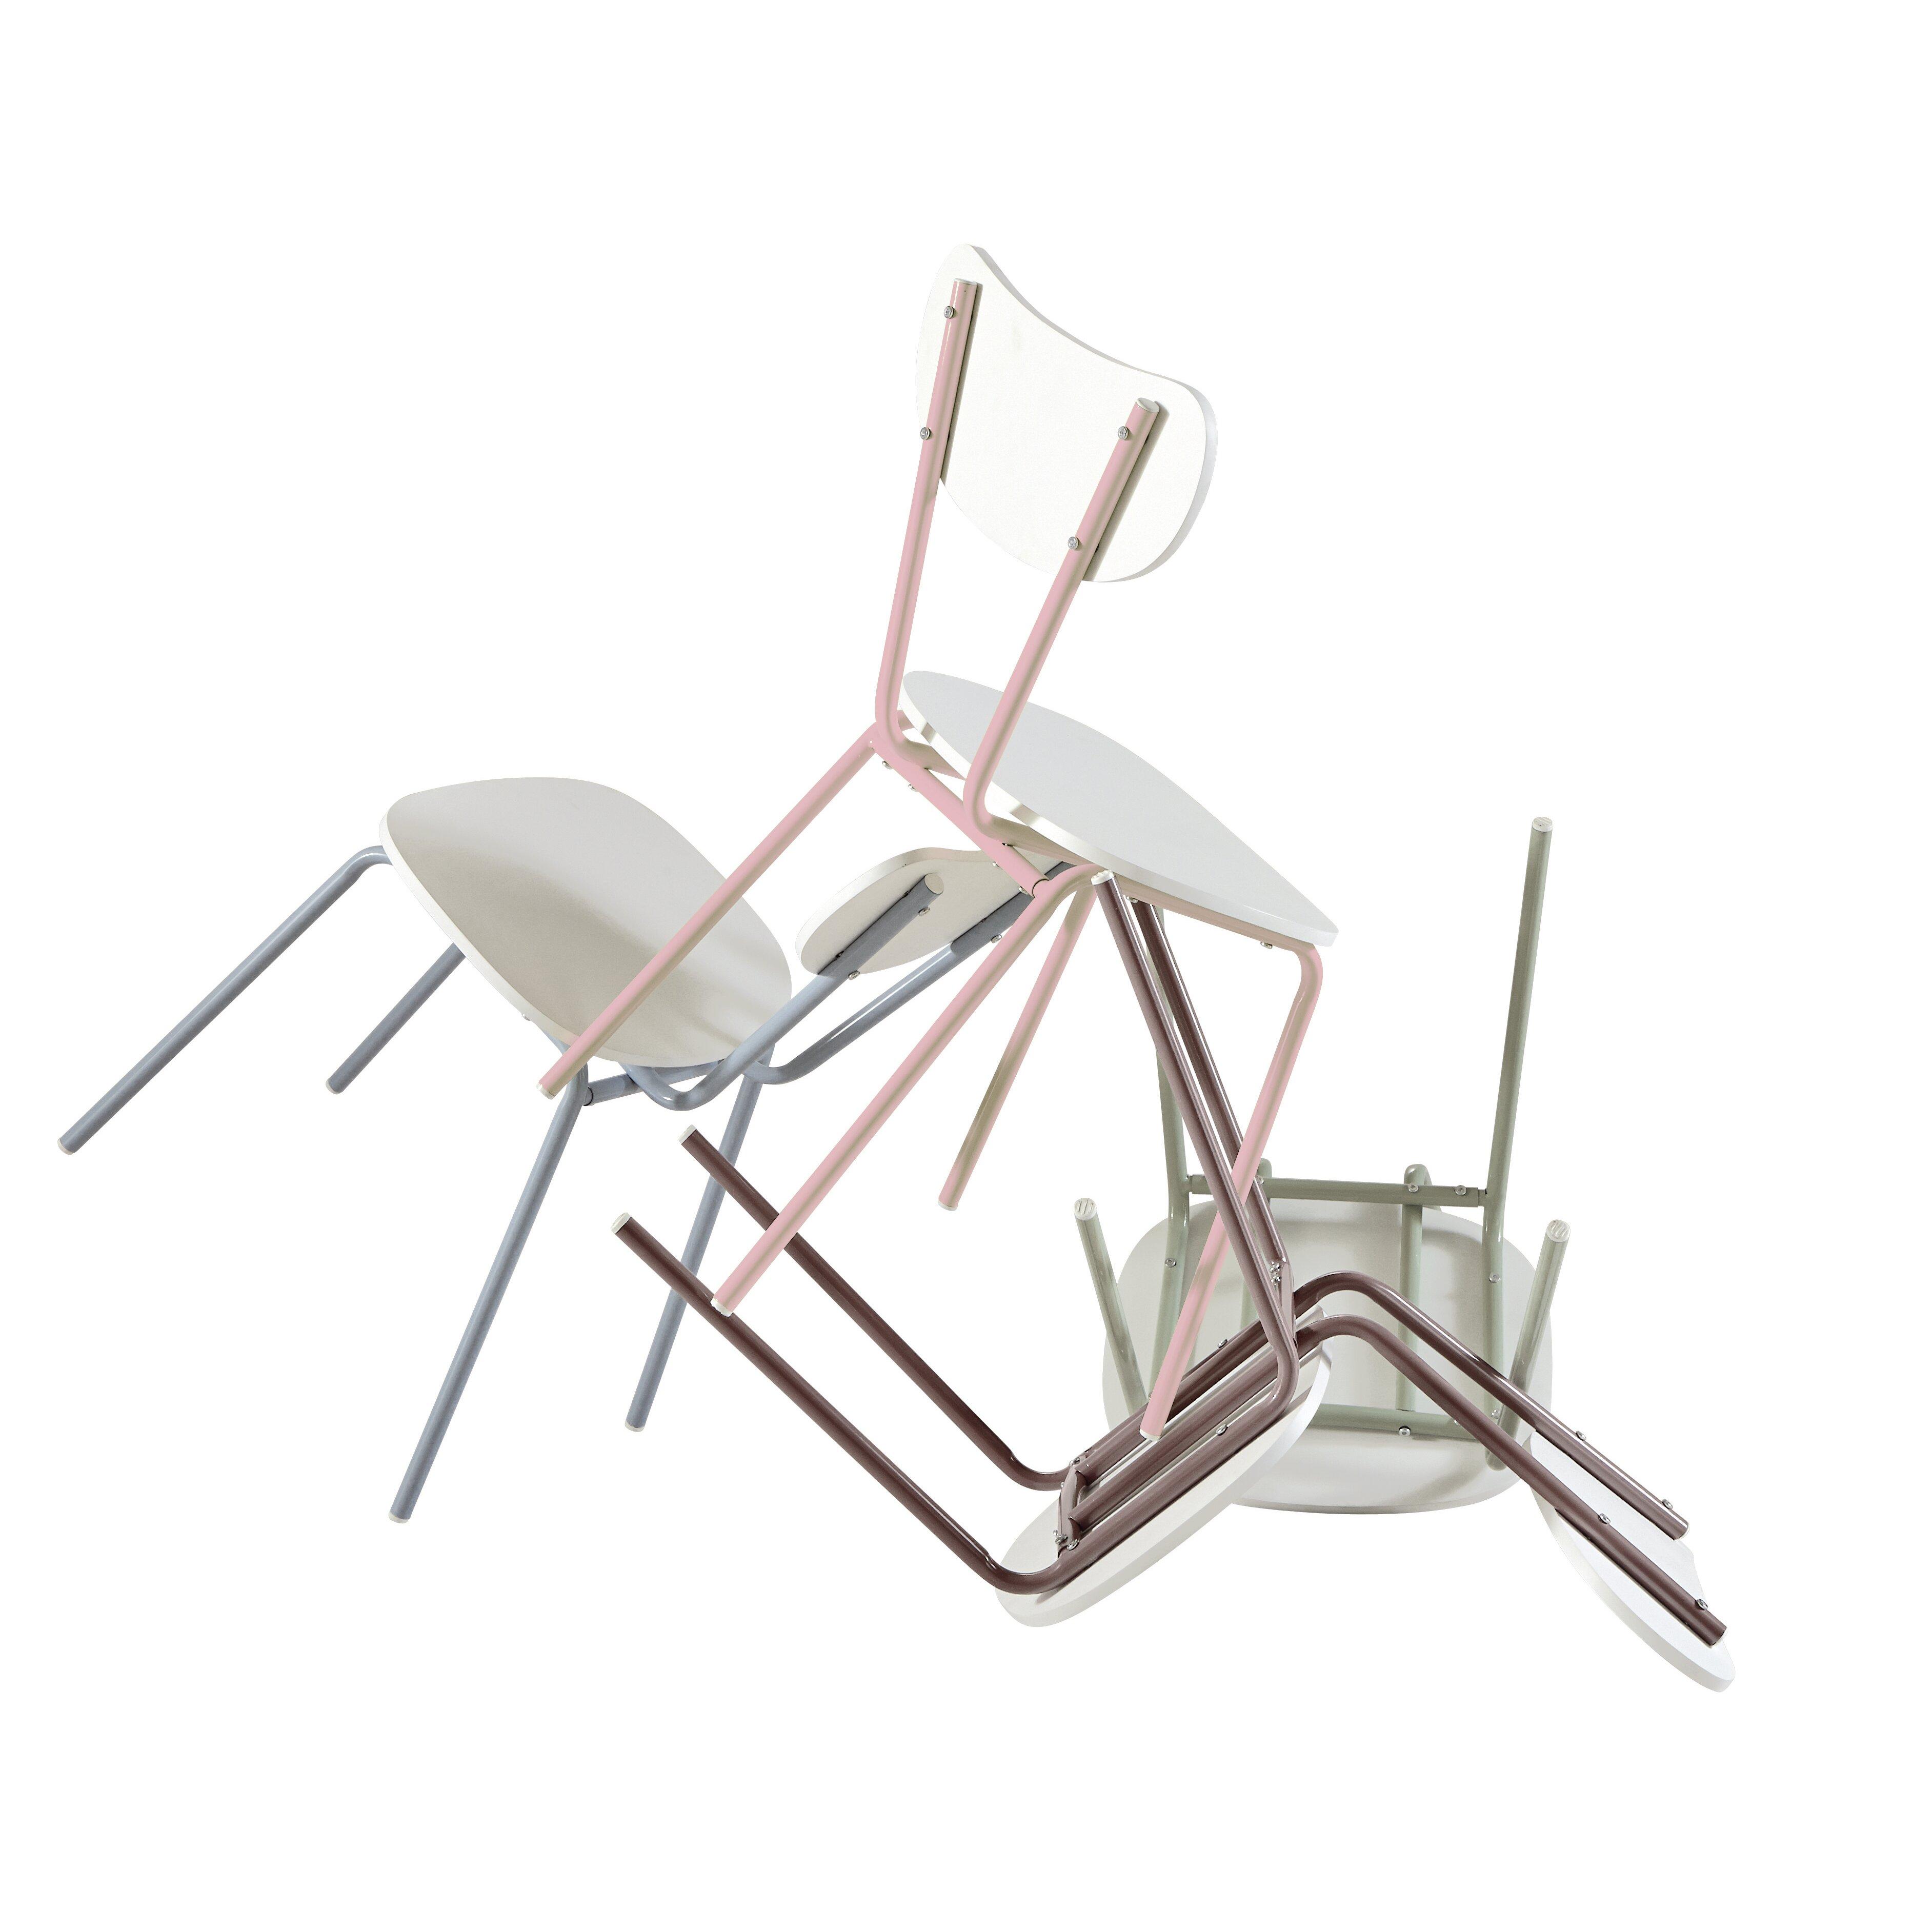 wayfair basics dining chair reviews wayfair uk. Black Bedroom Furniture Sets. Home Design Ideas